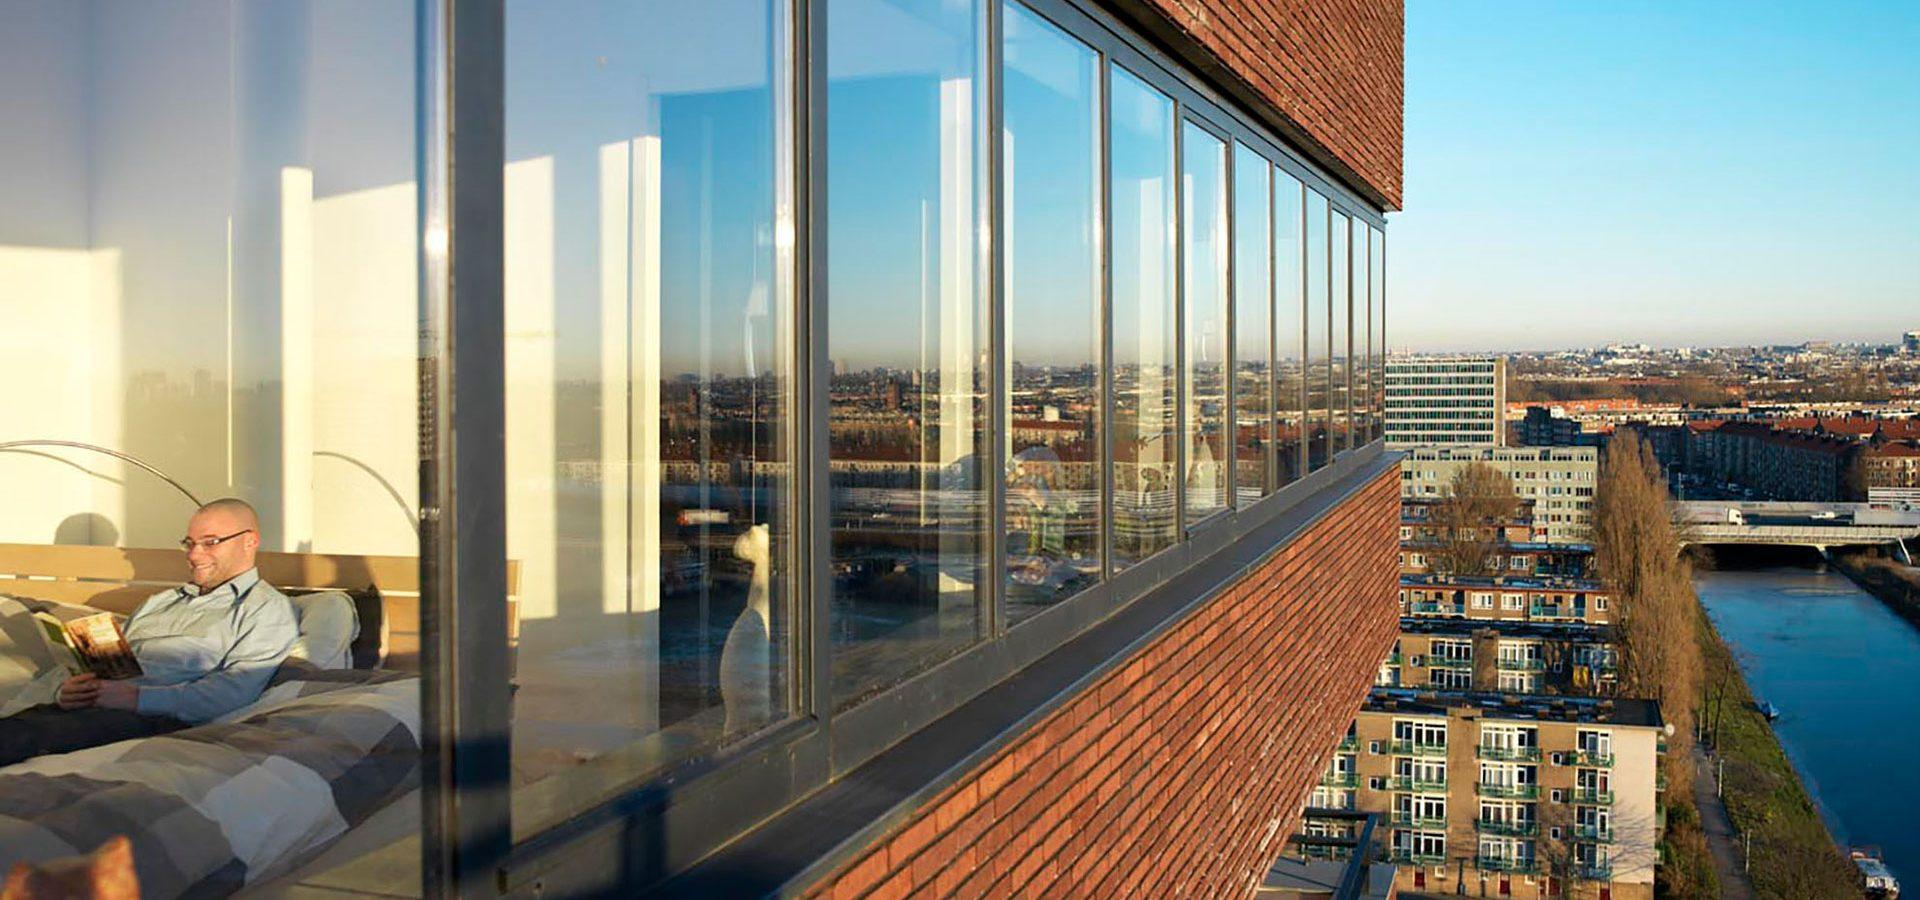 FARO architecten Scala Amsterdam 01